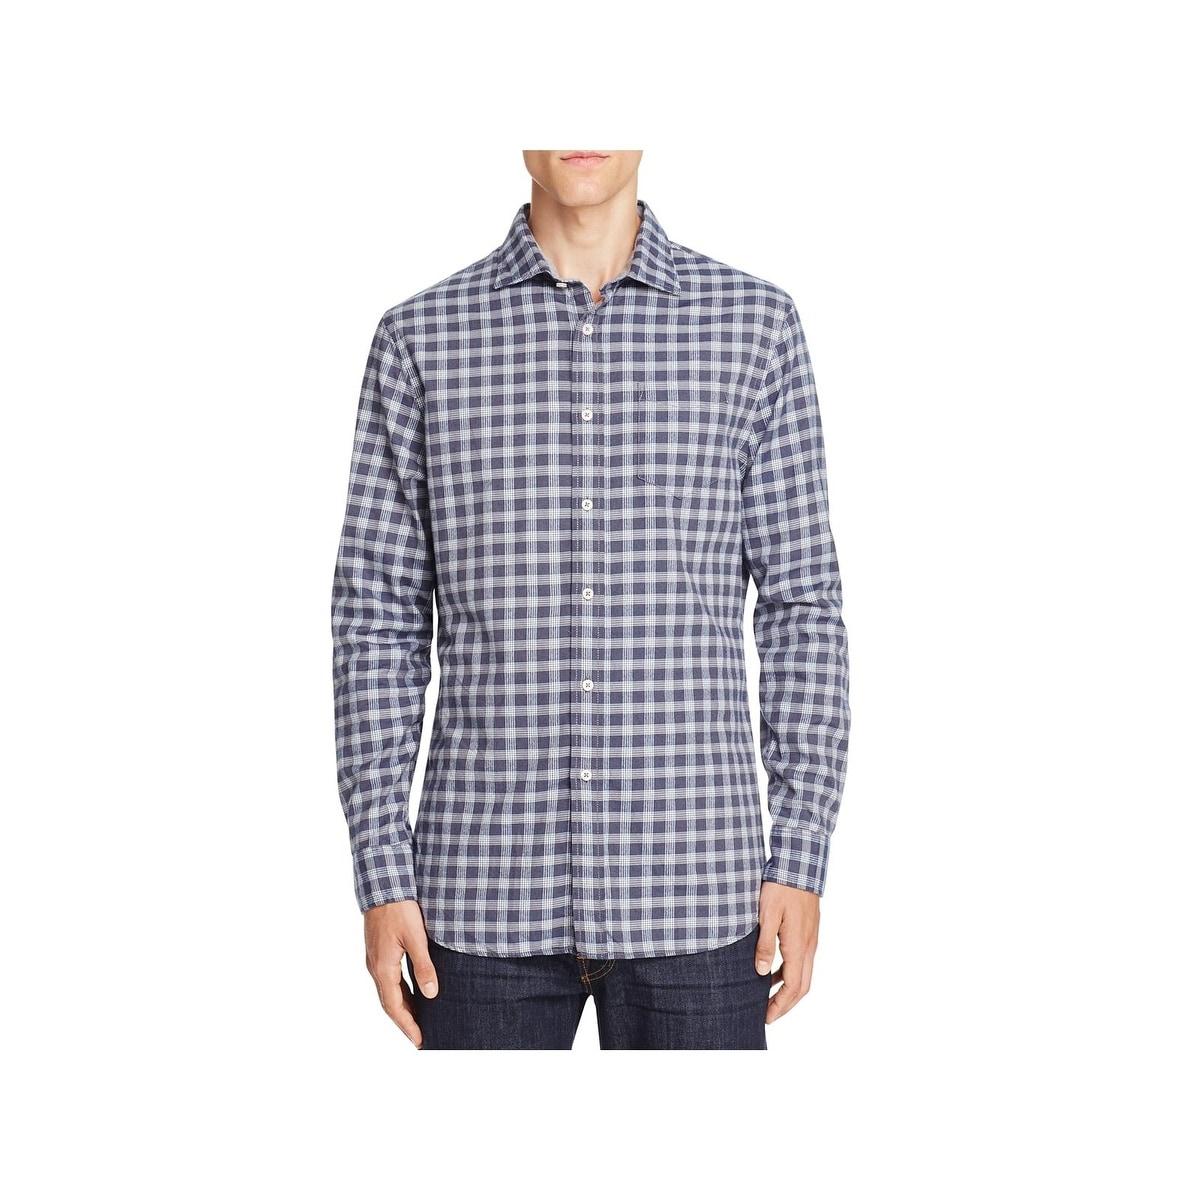 MOUTEN Mens Long Sleeve Casual Fleece Lined Slim Printed Button Down Dress Work Shirt